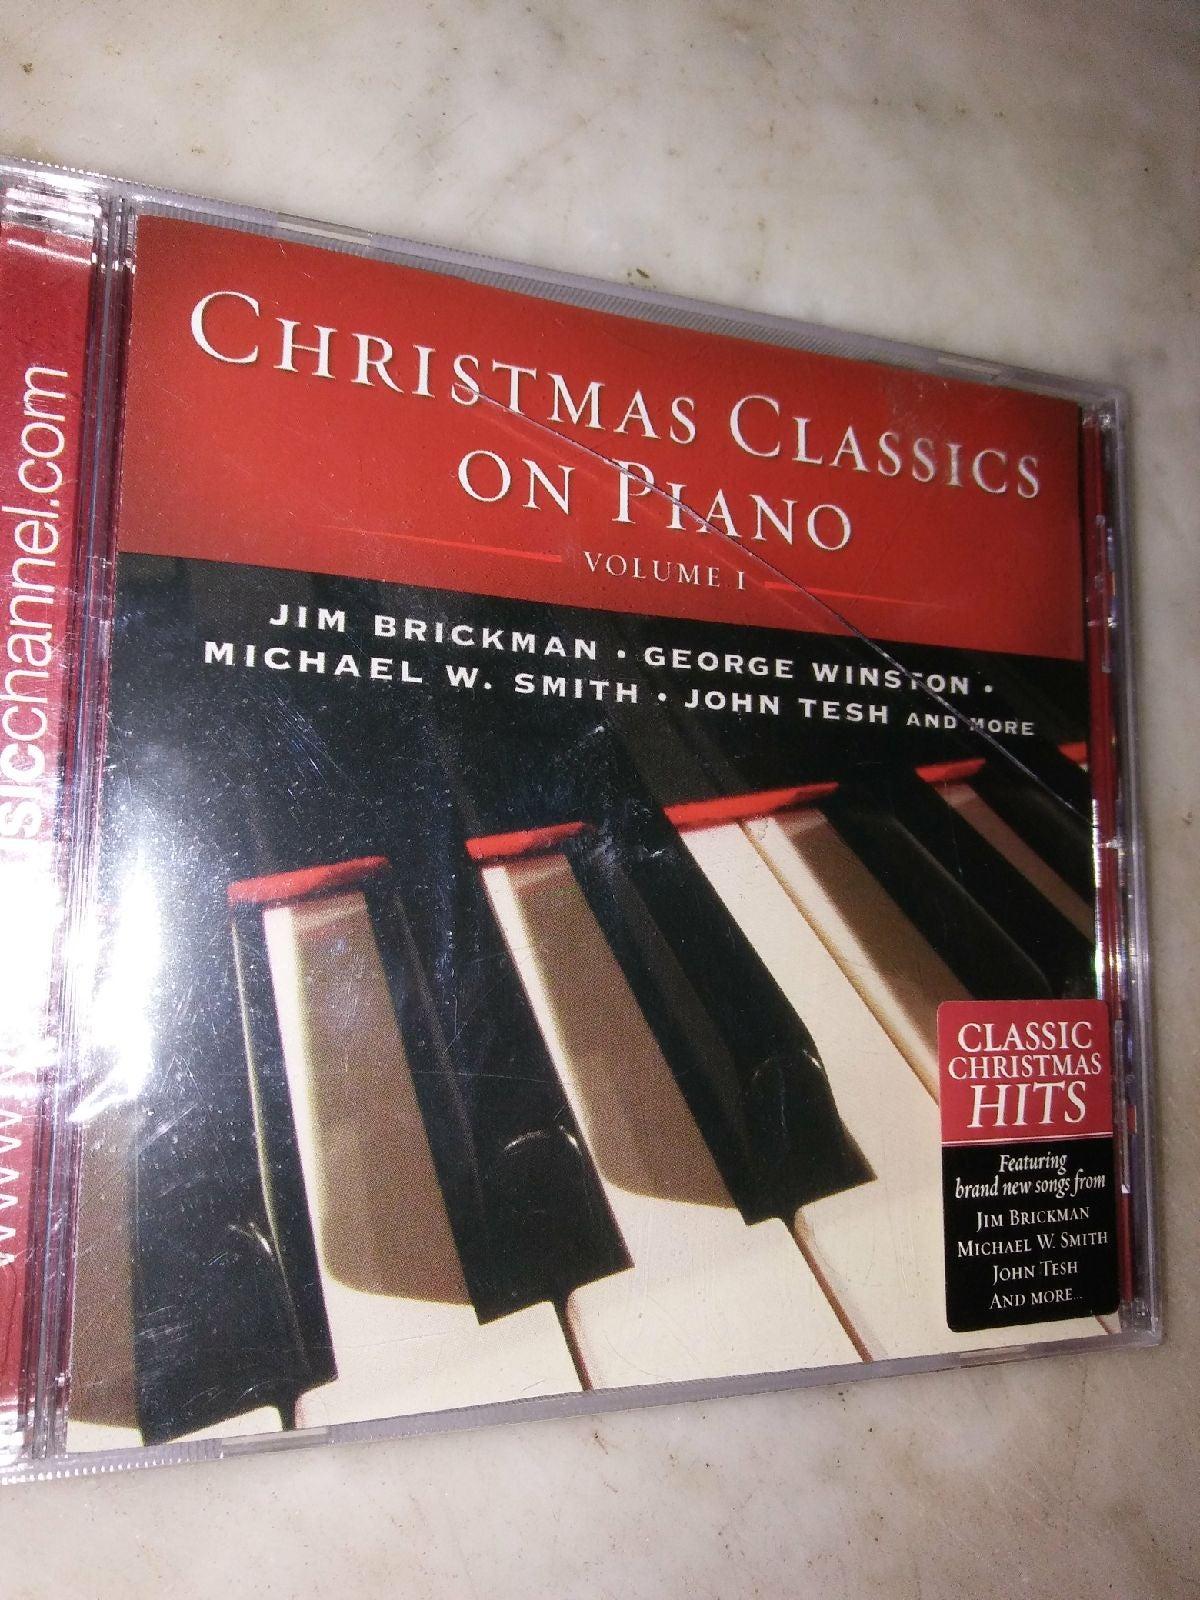 Christmas Classics on Piano CD vol 1